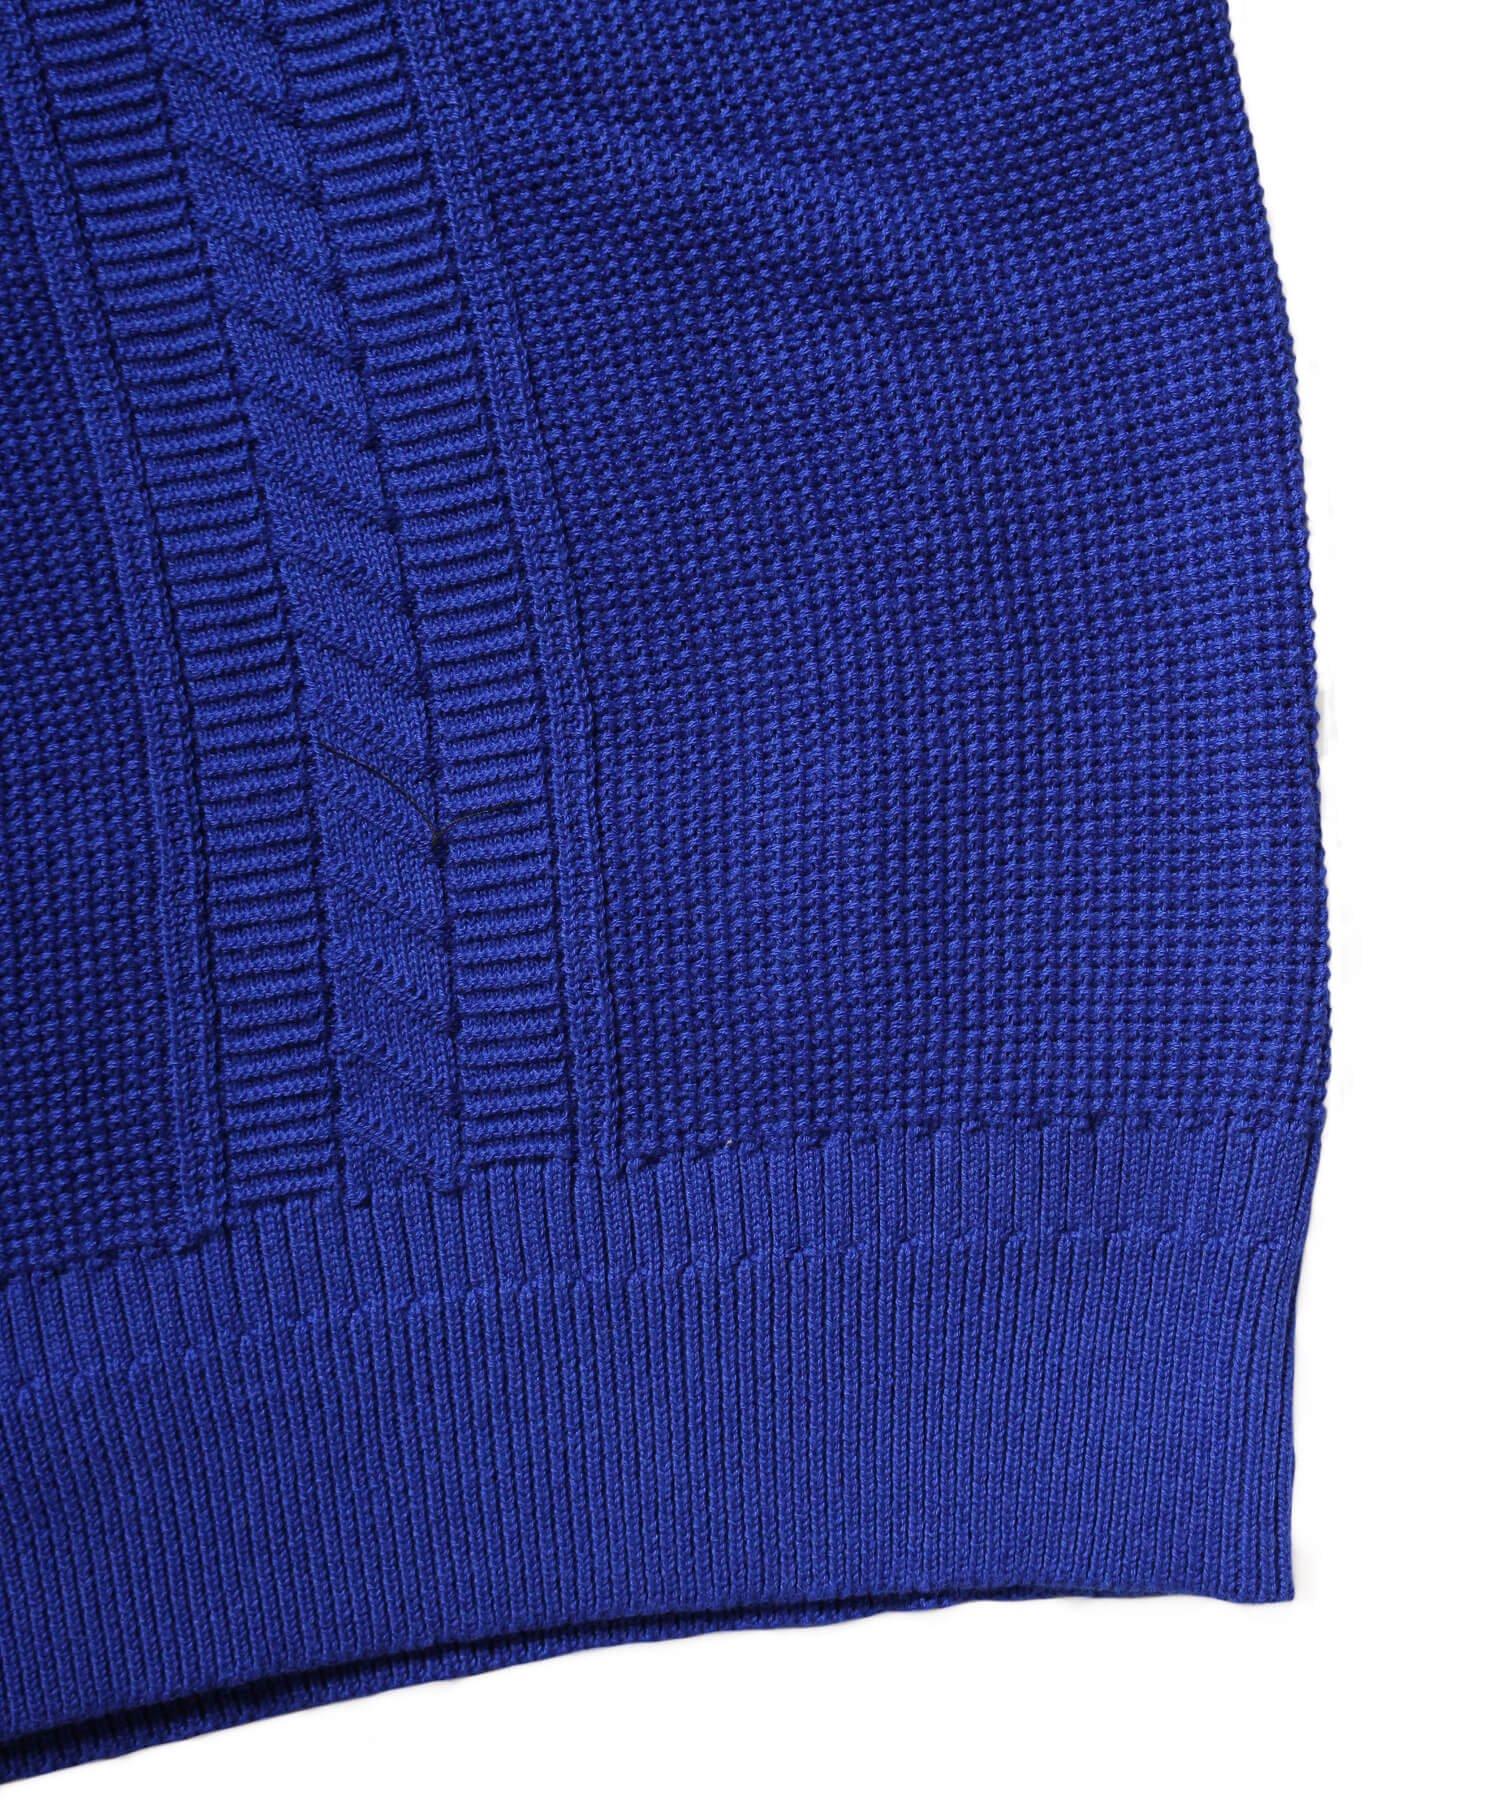 YASHIKI / ヤシキ |YASHIKI / ヤシキ × SIDEMILITIA inc. / サイドミリティア  RYUREI KNIT (LIMITED BLUE/WOMEN'S) 商品画像7